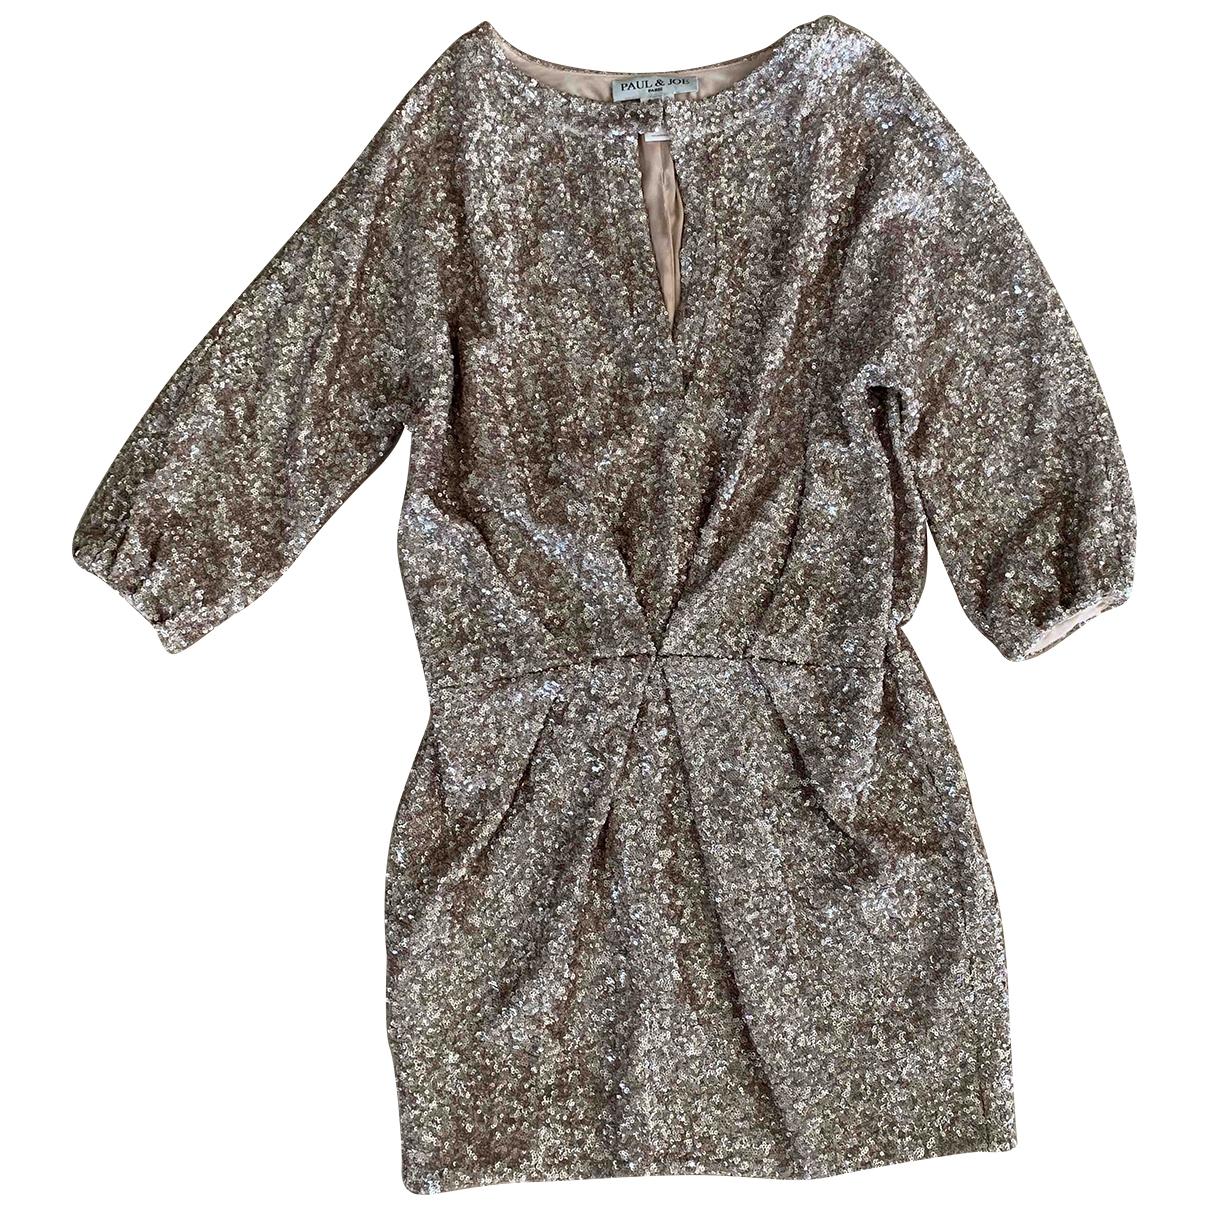 Paul & Joe \N Gold dress for Women 38 FR